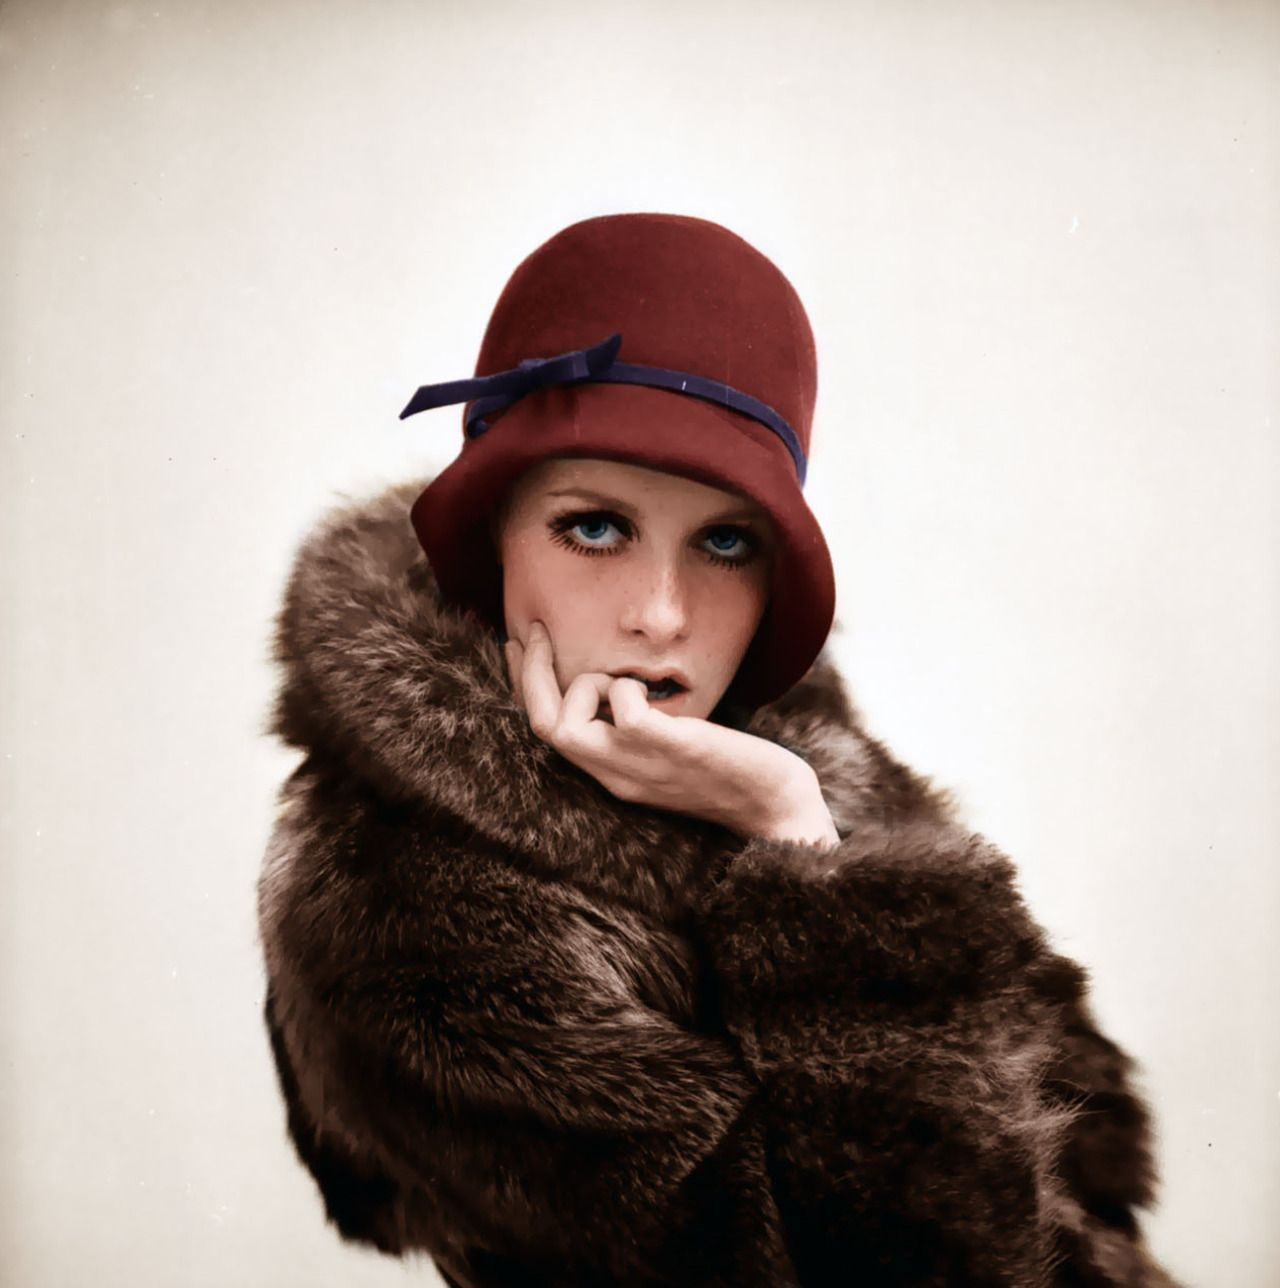 Twiggy - photo by Terry Fincher - 1966.